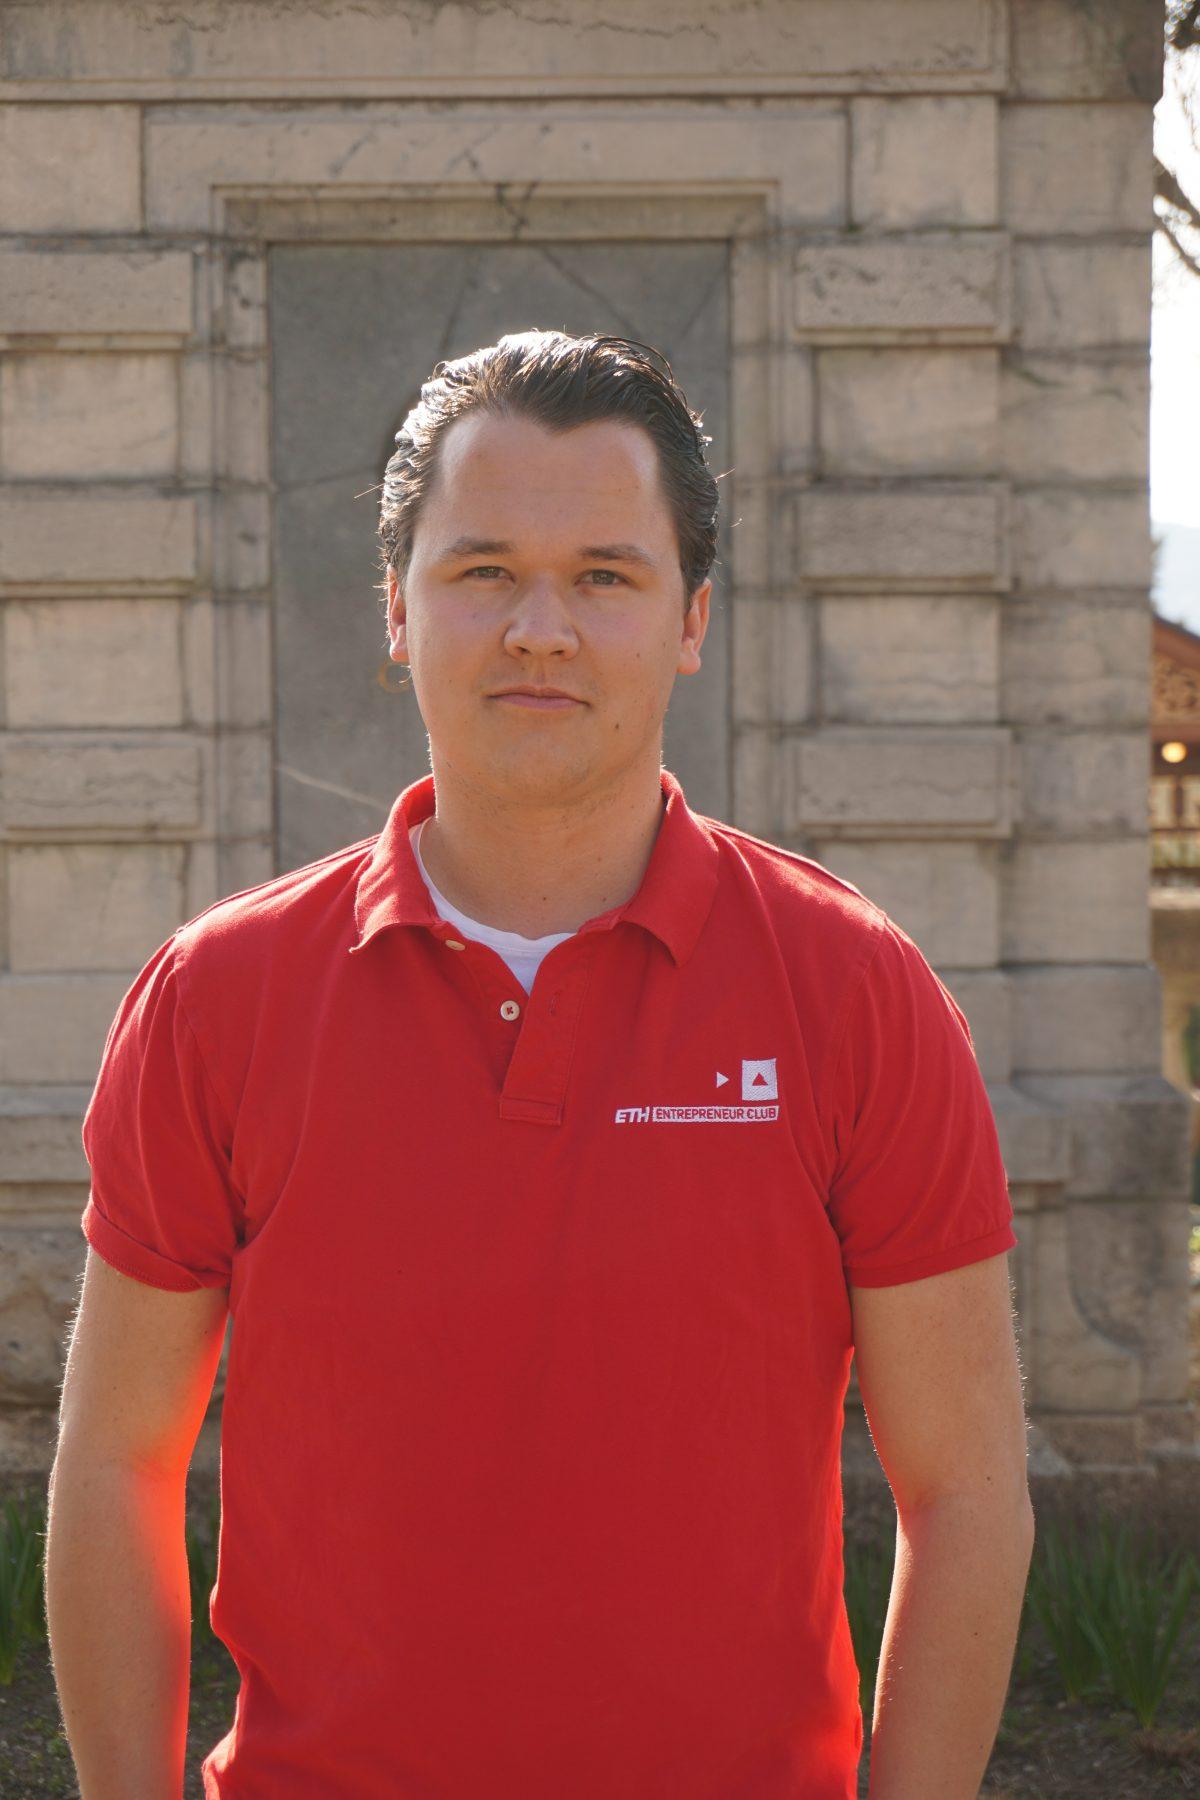 Linus Joos, President ETH Entrepreneur Club   ETH Centre for Students & Entrepreneurs